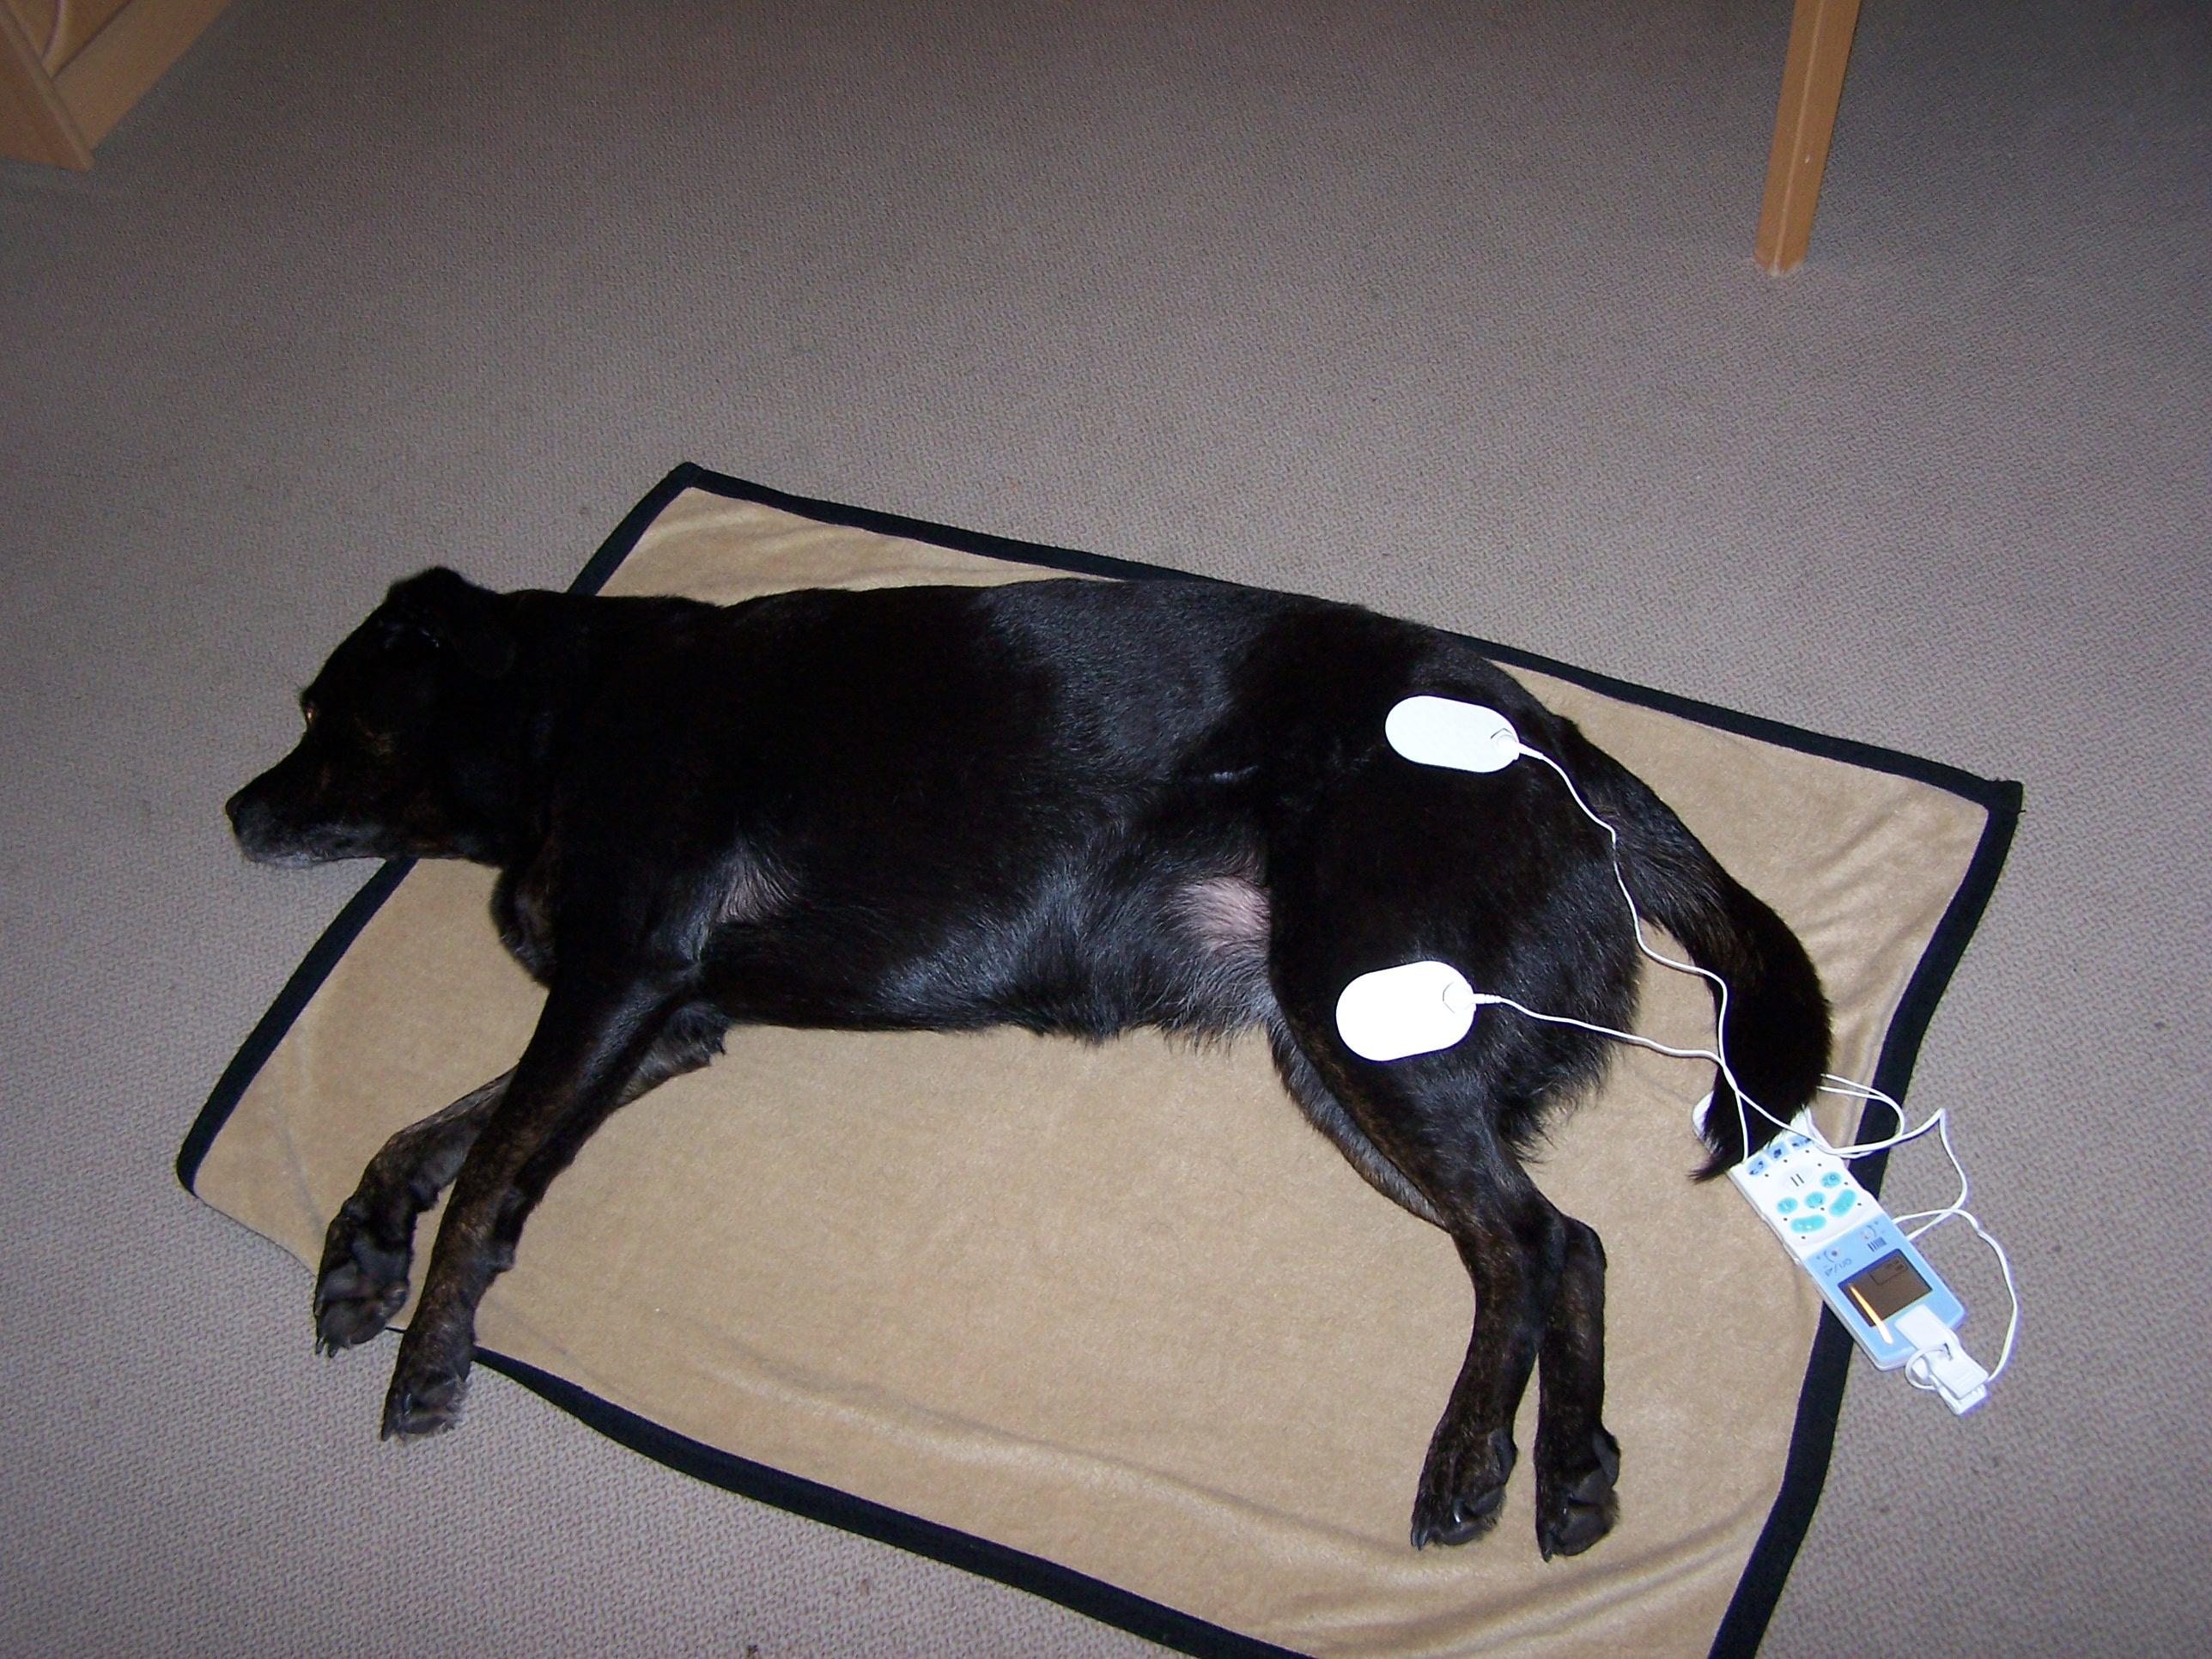 Elektrotherapie TENS für Hunde